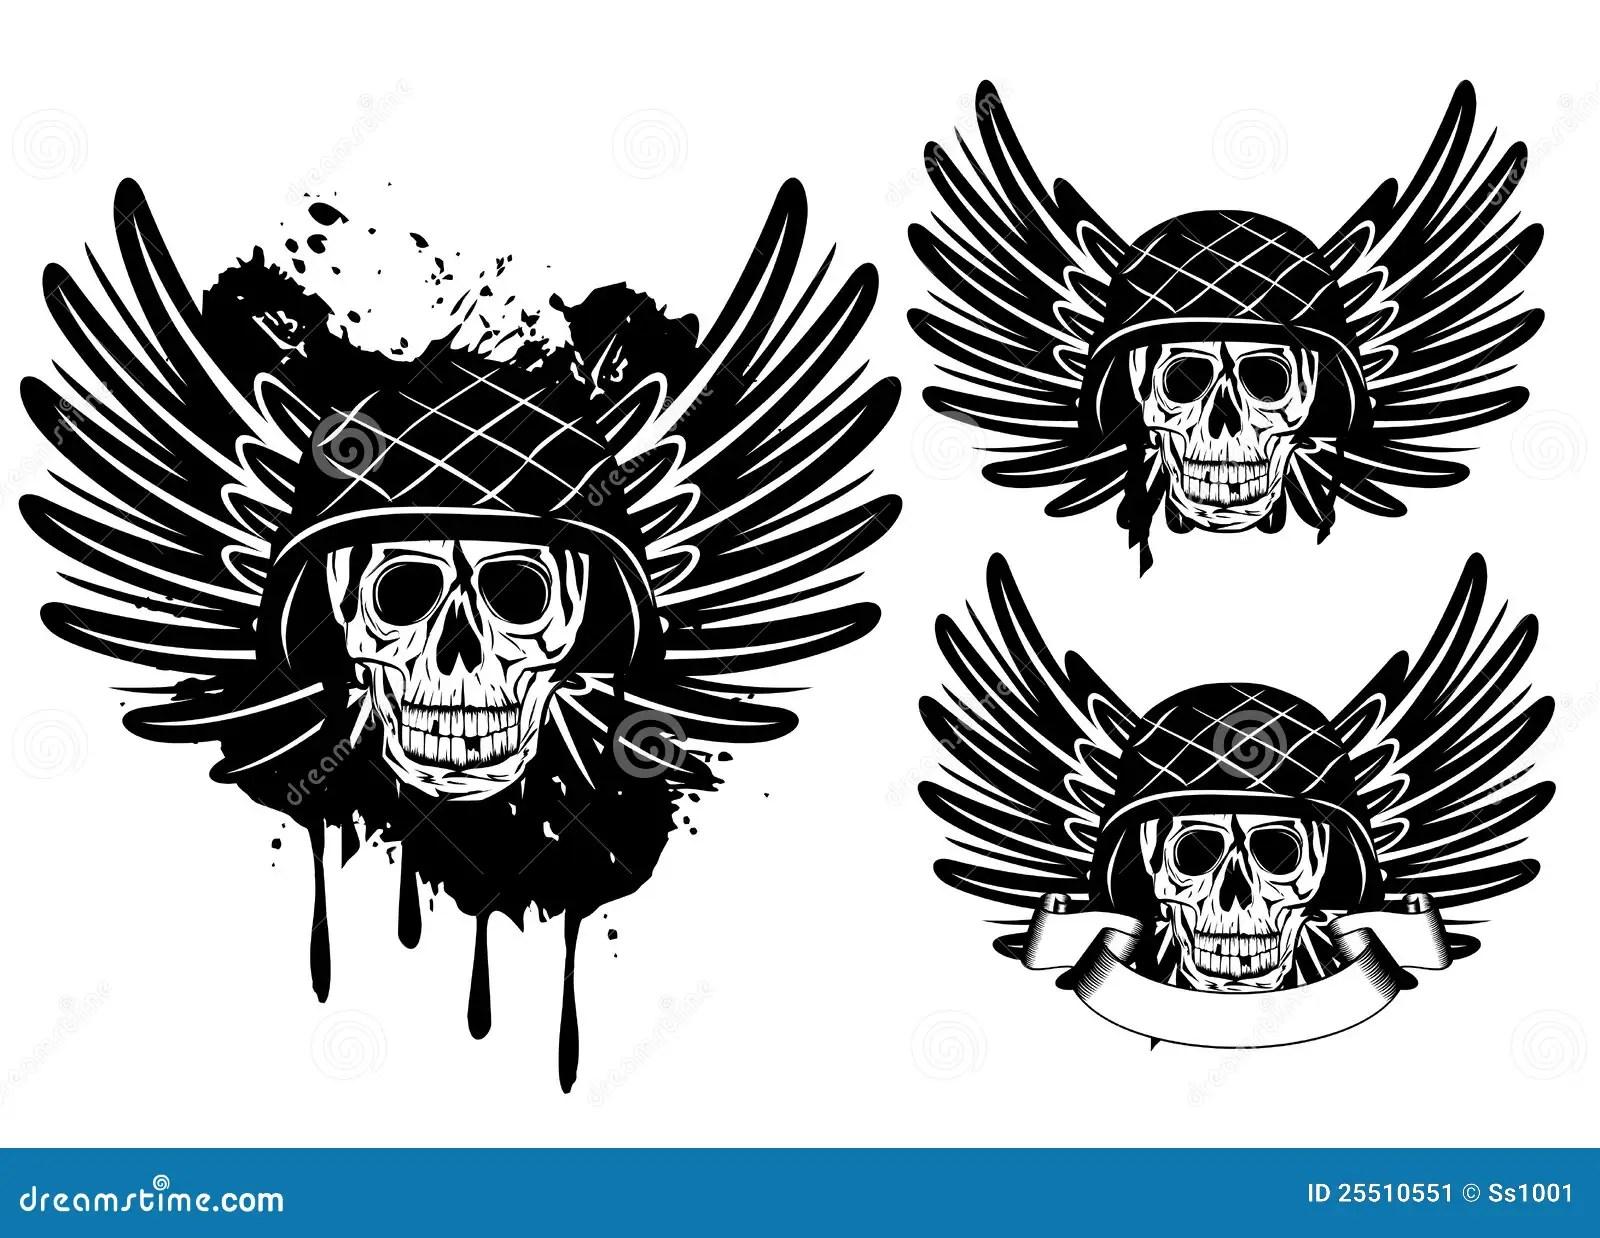 Skull In Helmet And Wings Stock Image